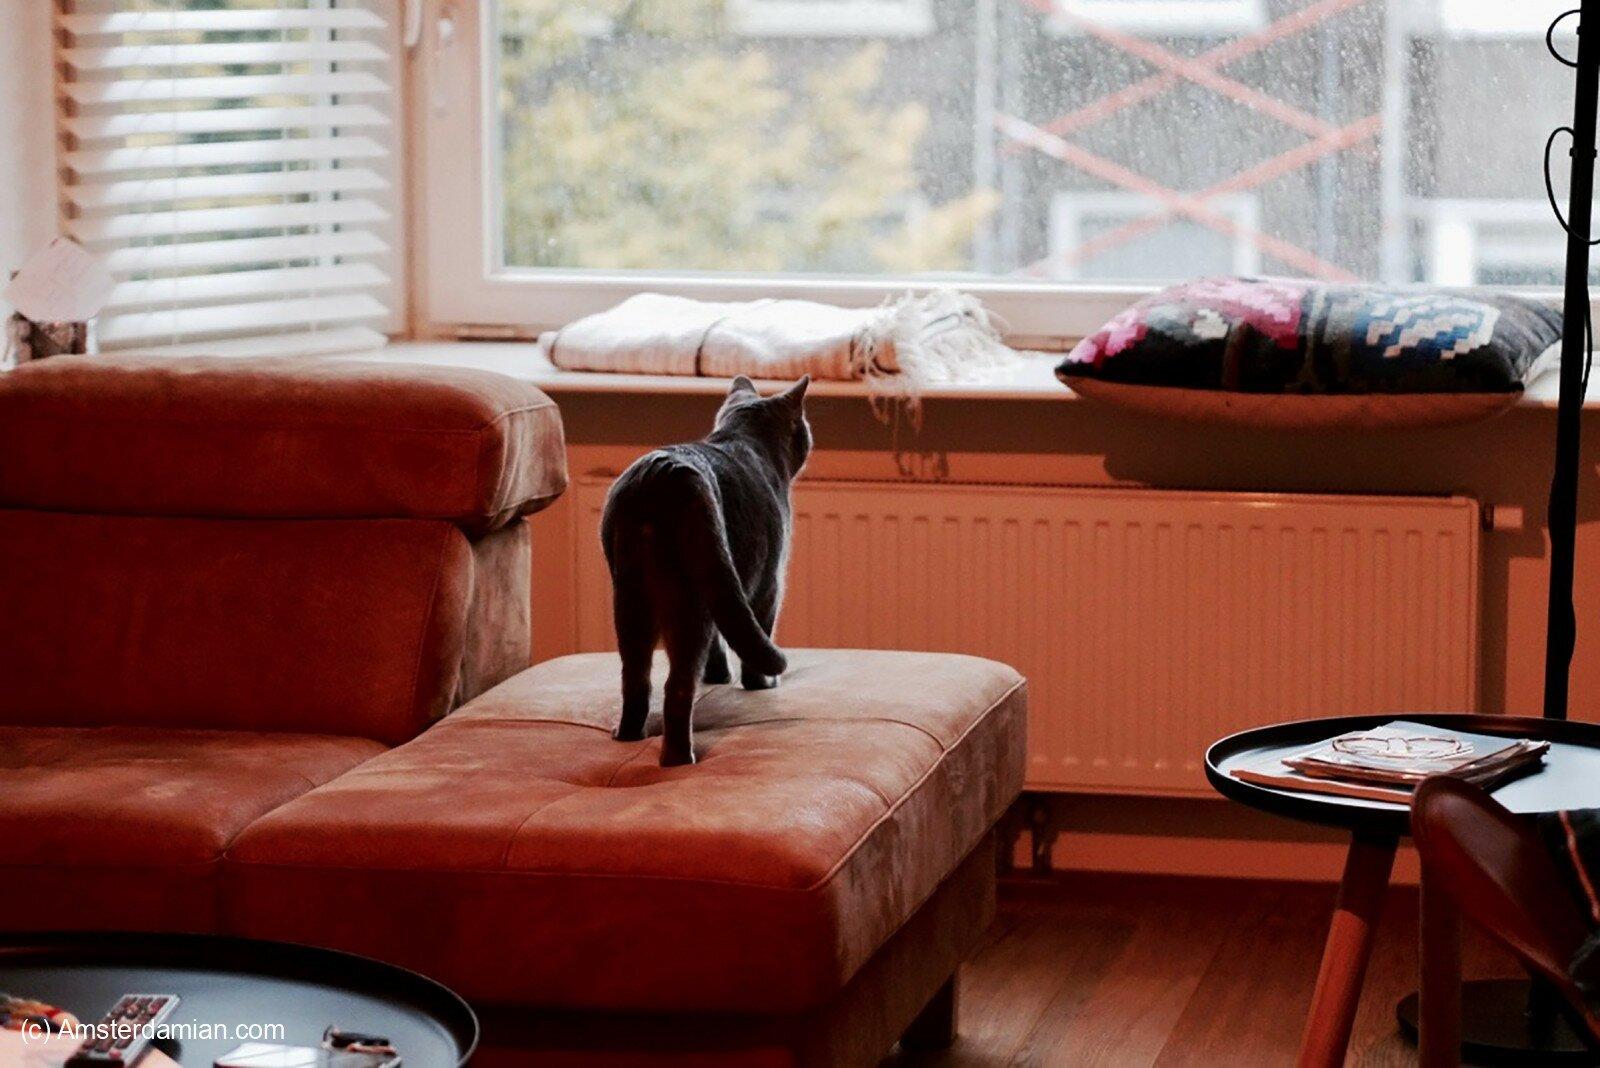 Pet photography 22